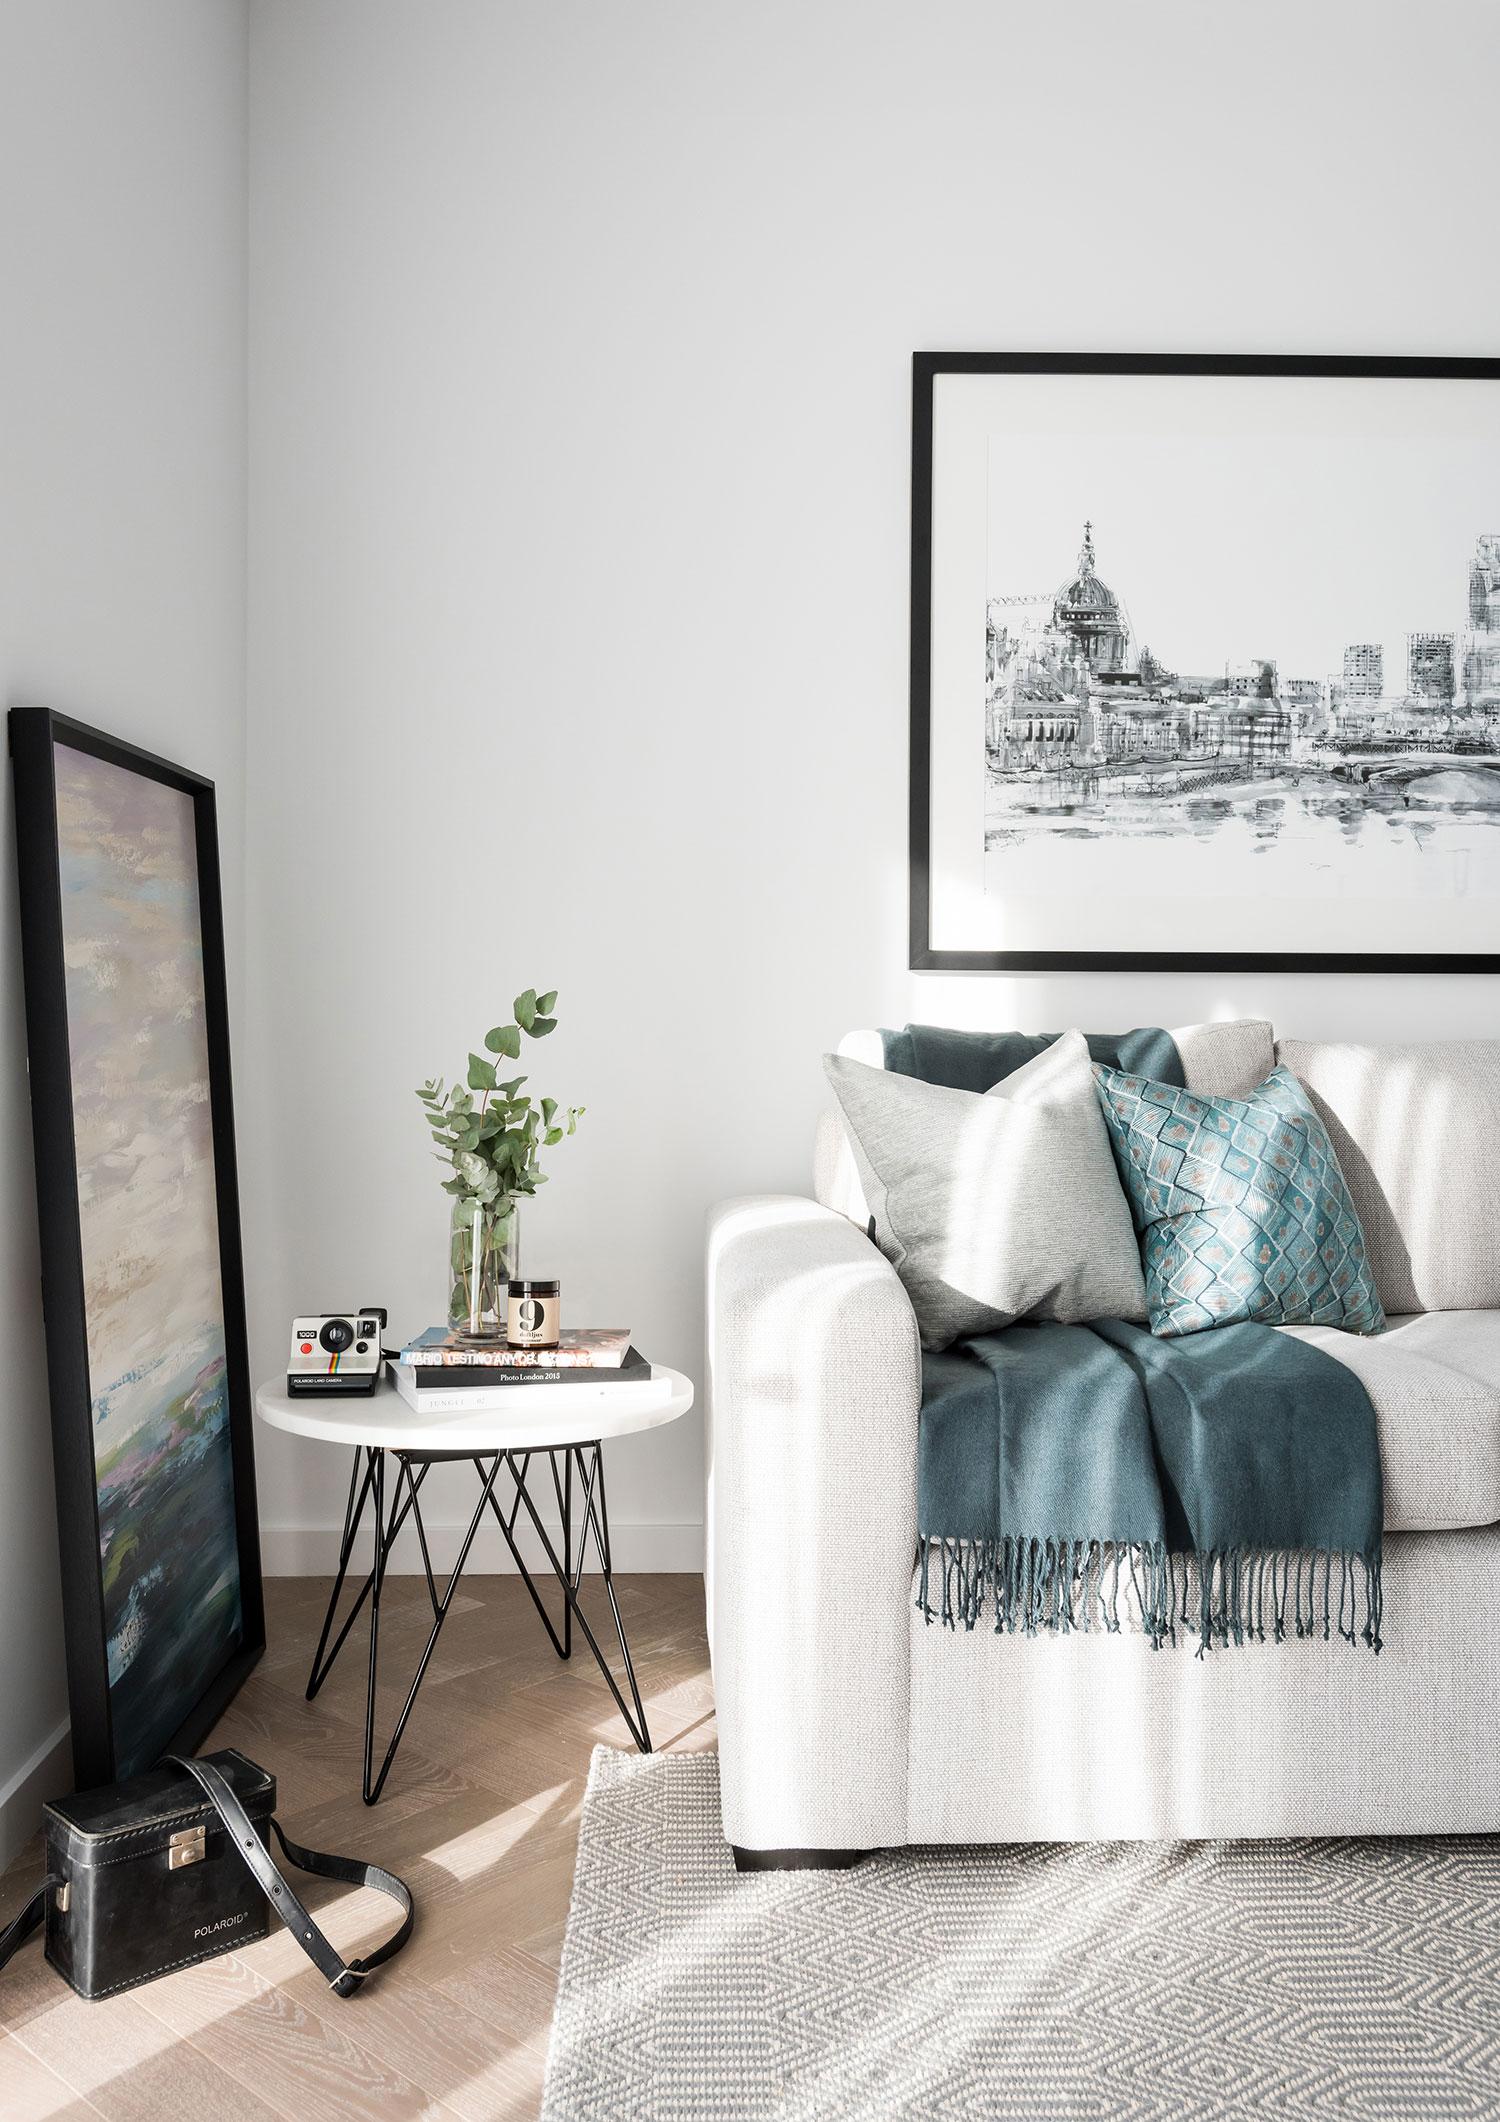 BoxNine7_Battersea_Power_Station_03_Living_Room_Entrance_Area_Sitting_Room.jpg